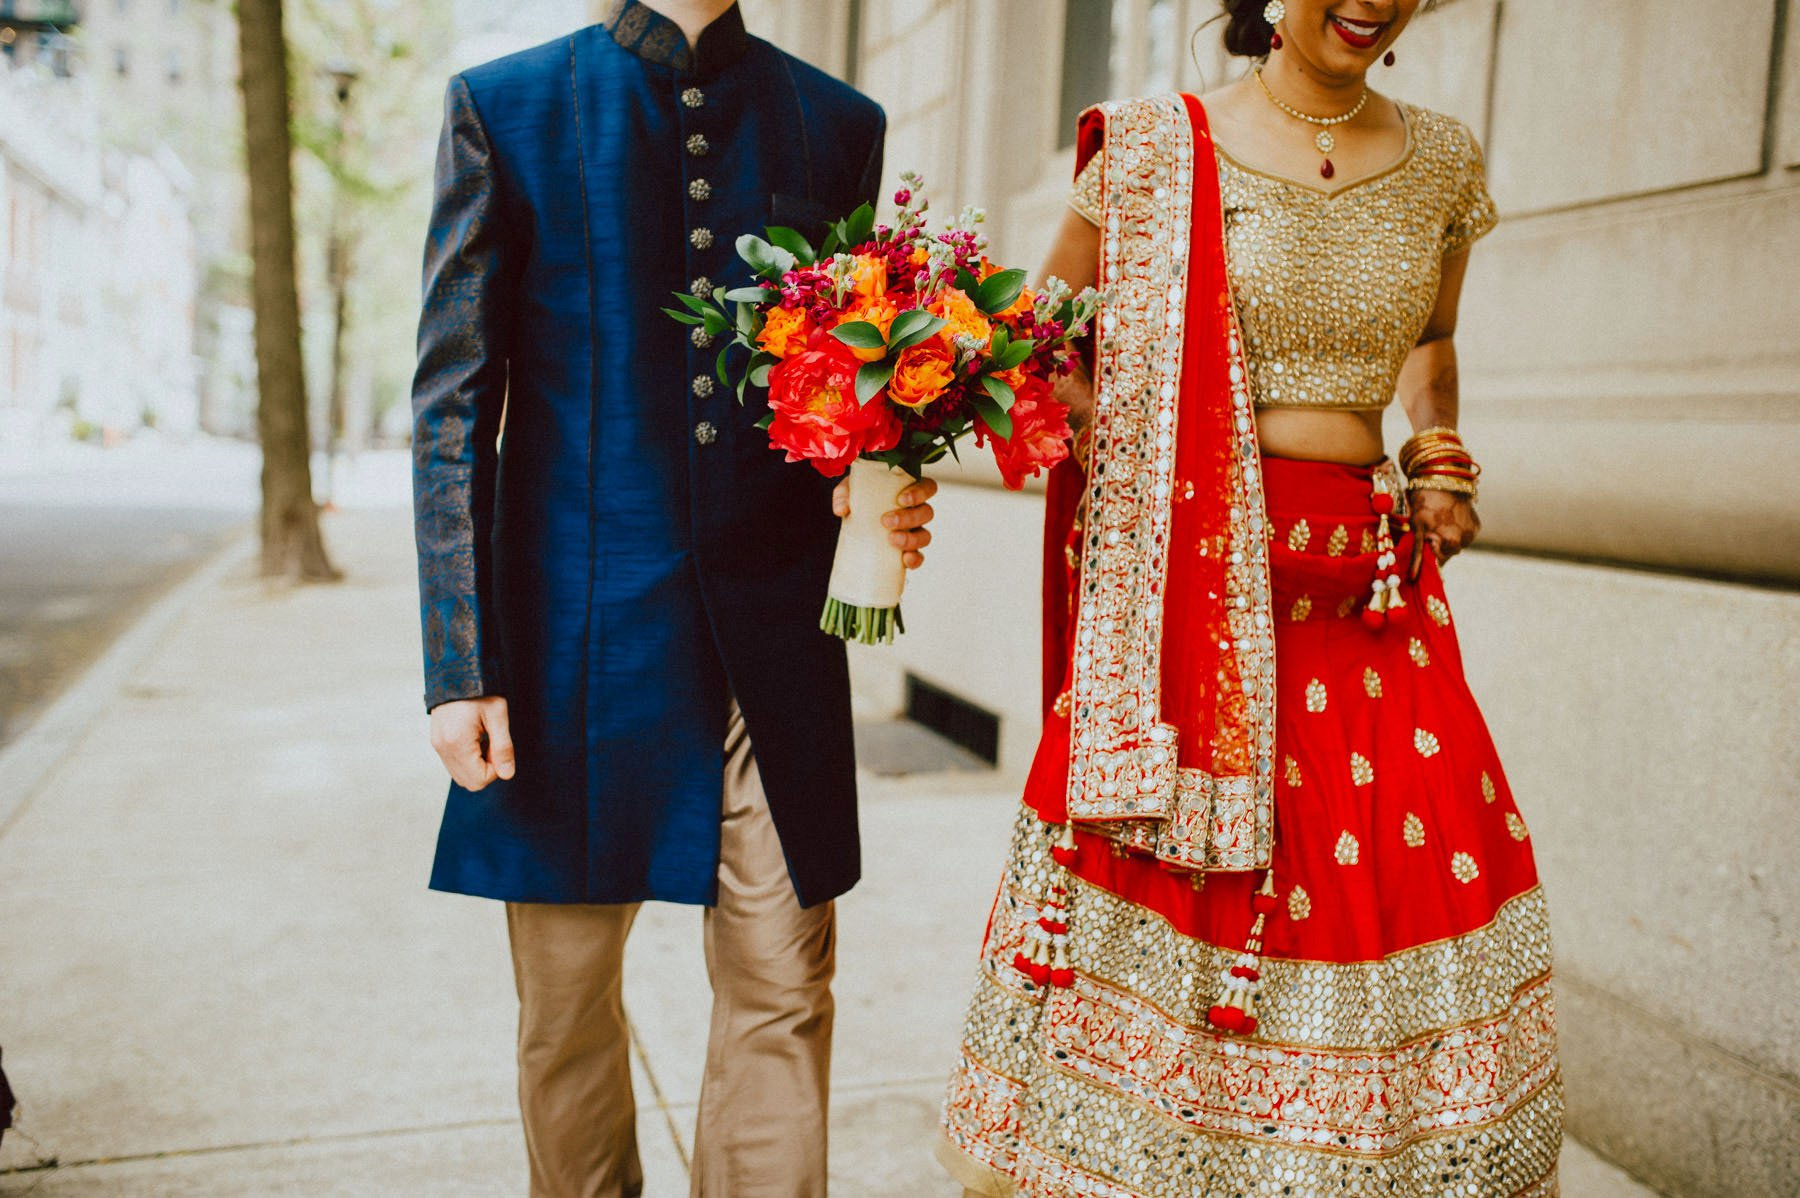 vie-philadelphia-indian-wedding-42.jpg